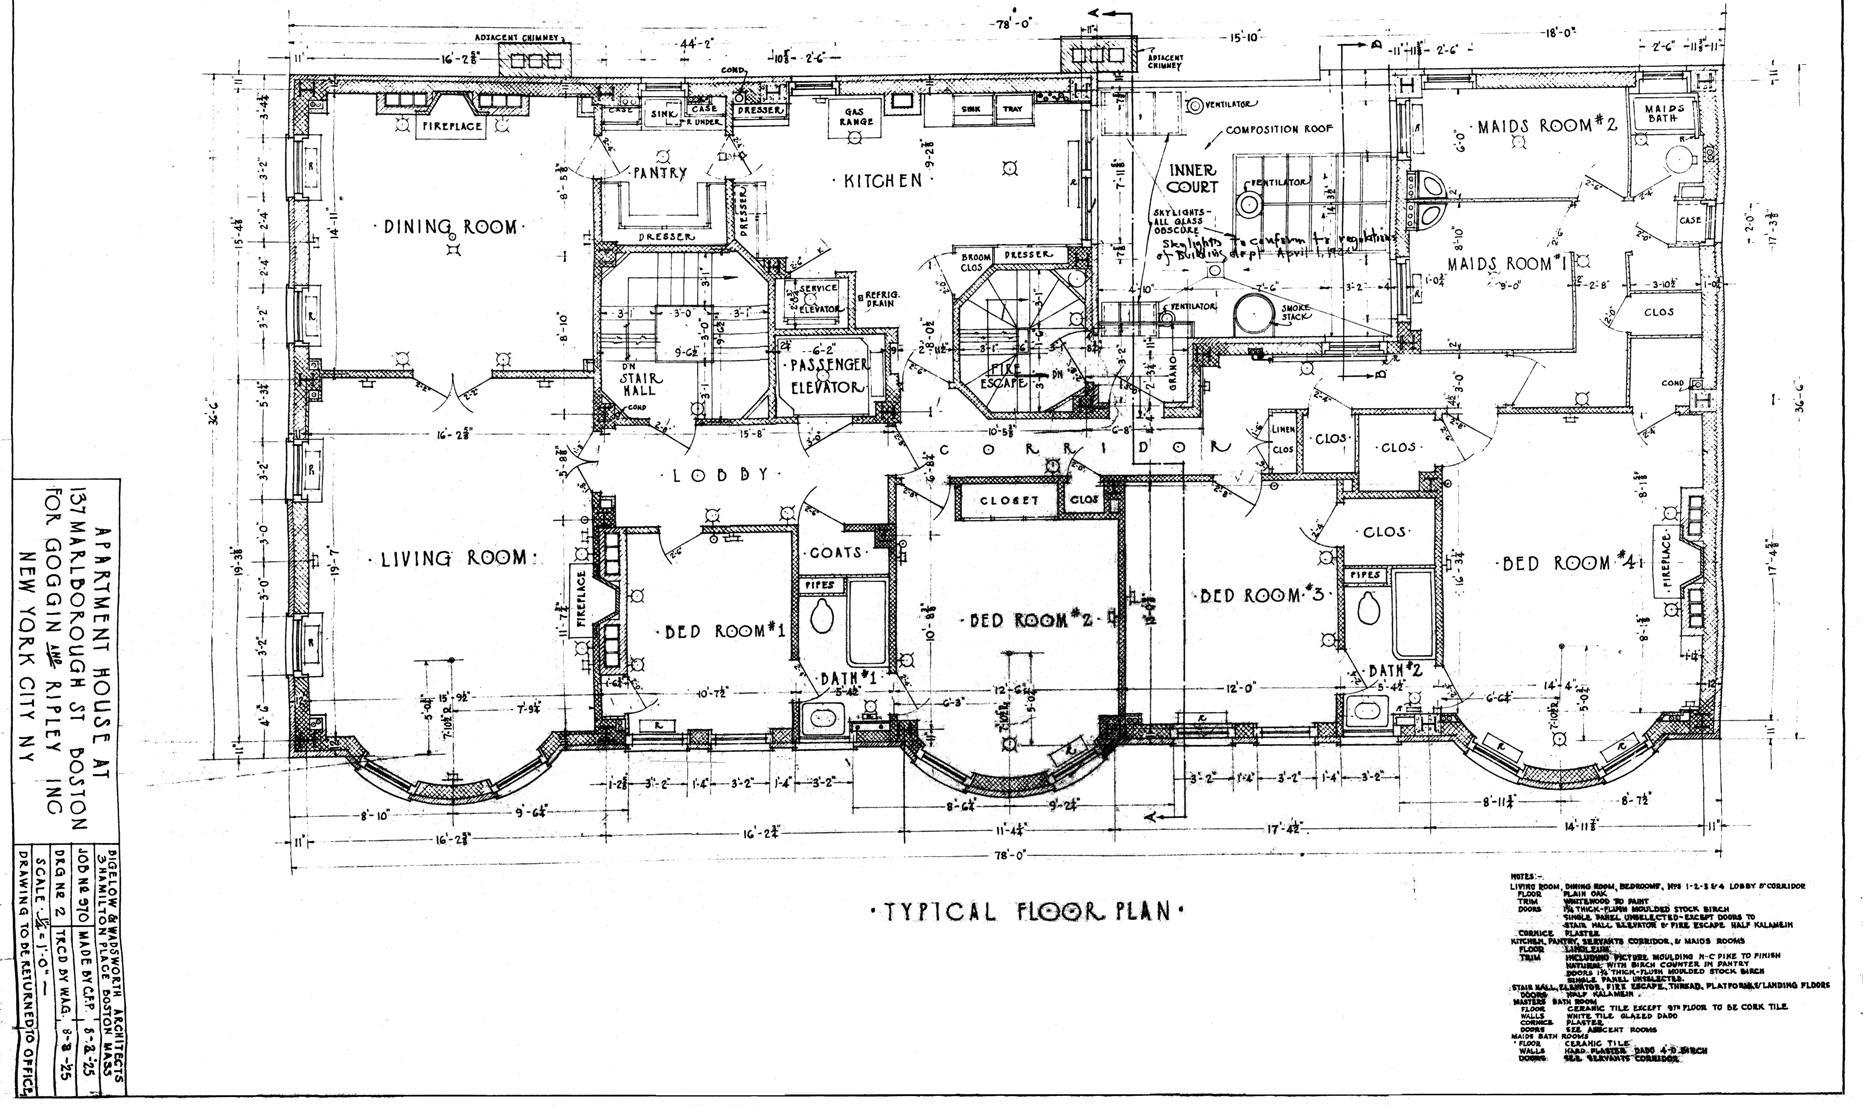 Architectural Plans: 137 Marlborough (1925)